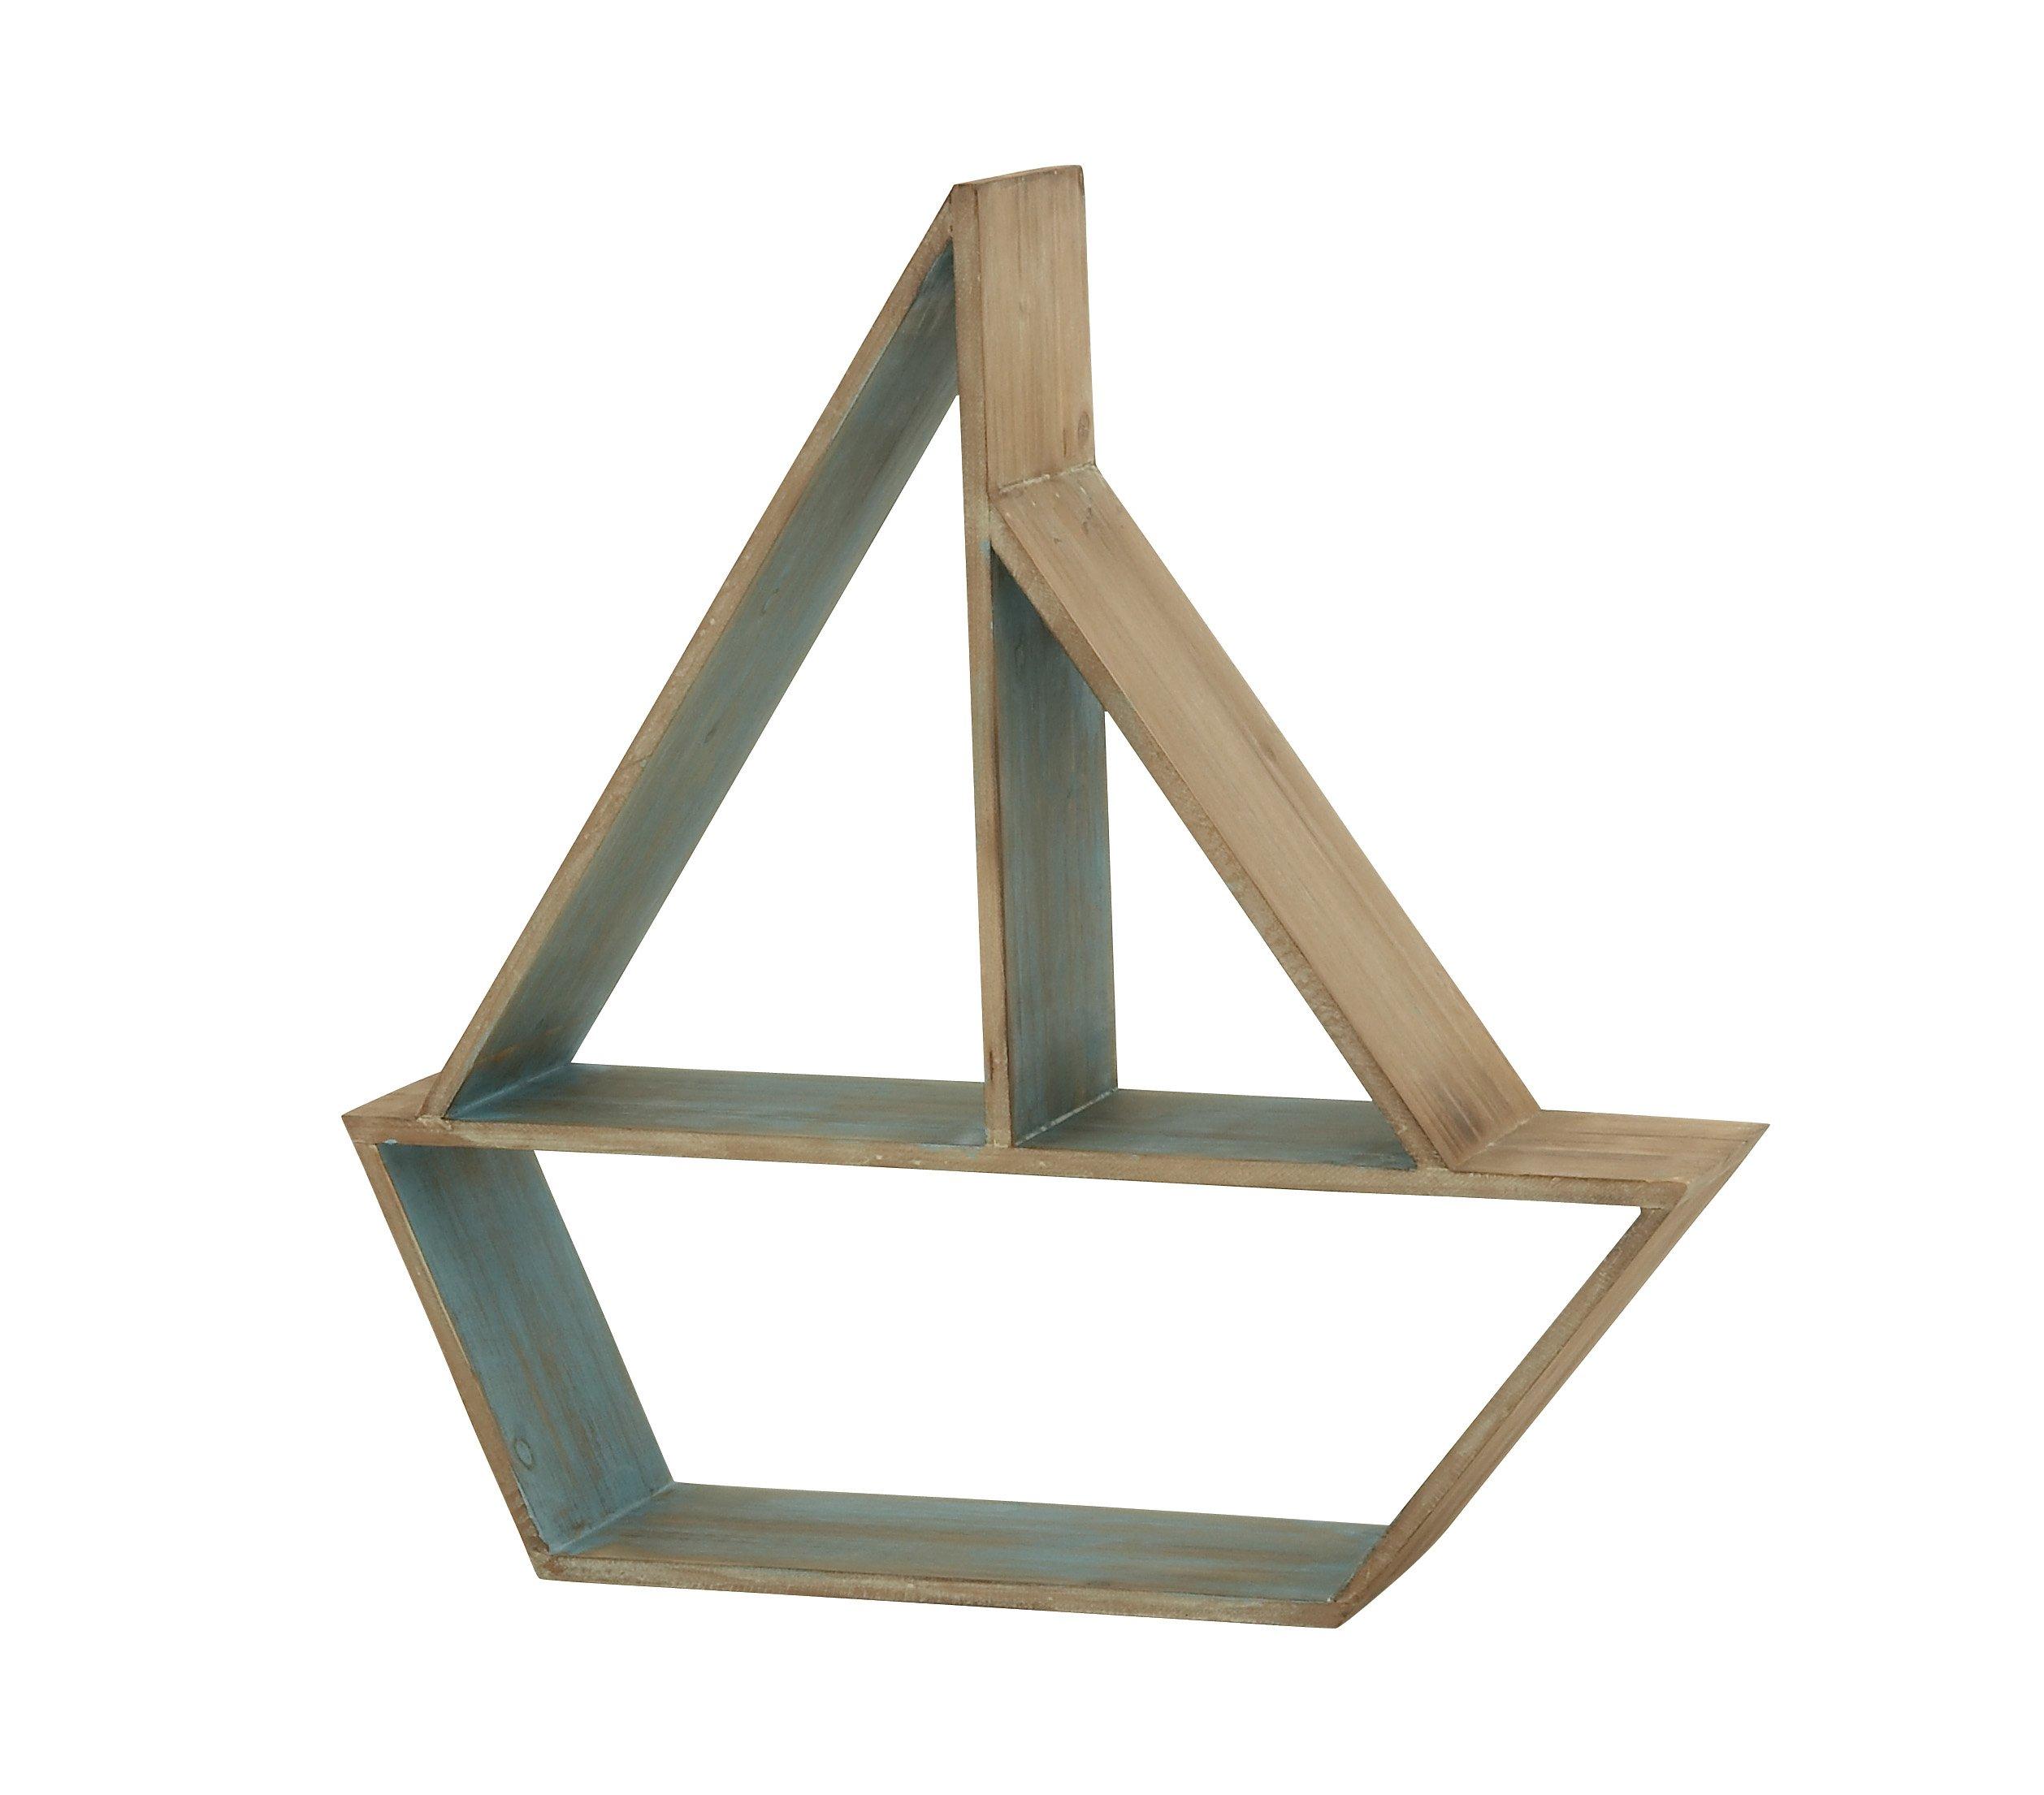 Deco 79 97728 Wood Table Boat Shelf, 24'' x 24''